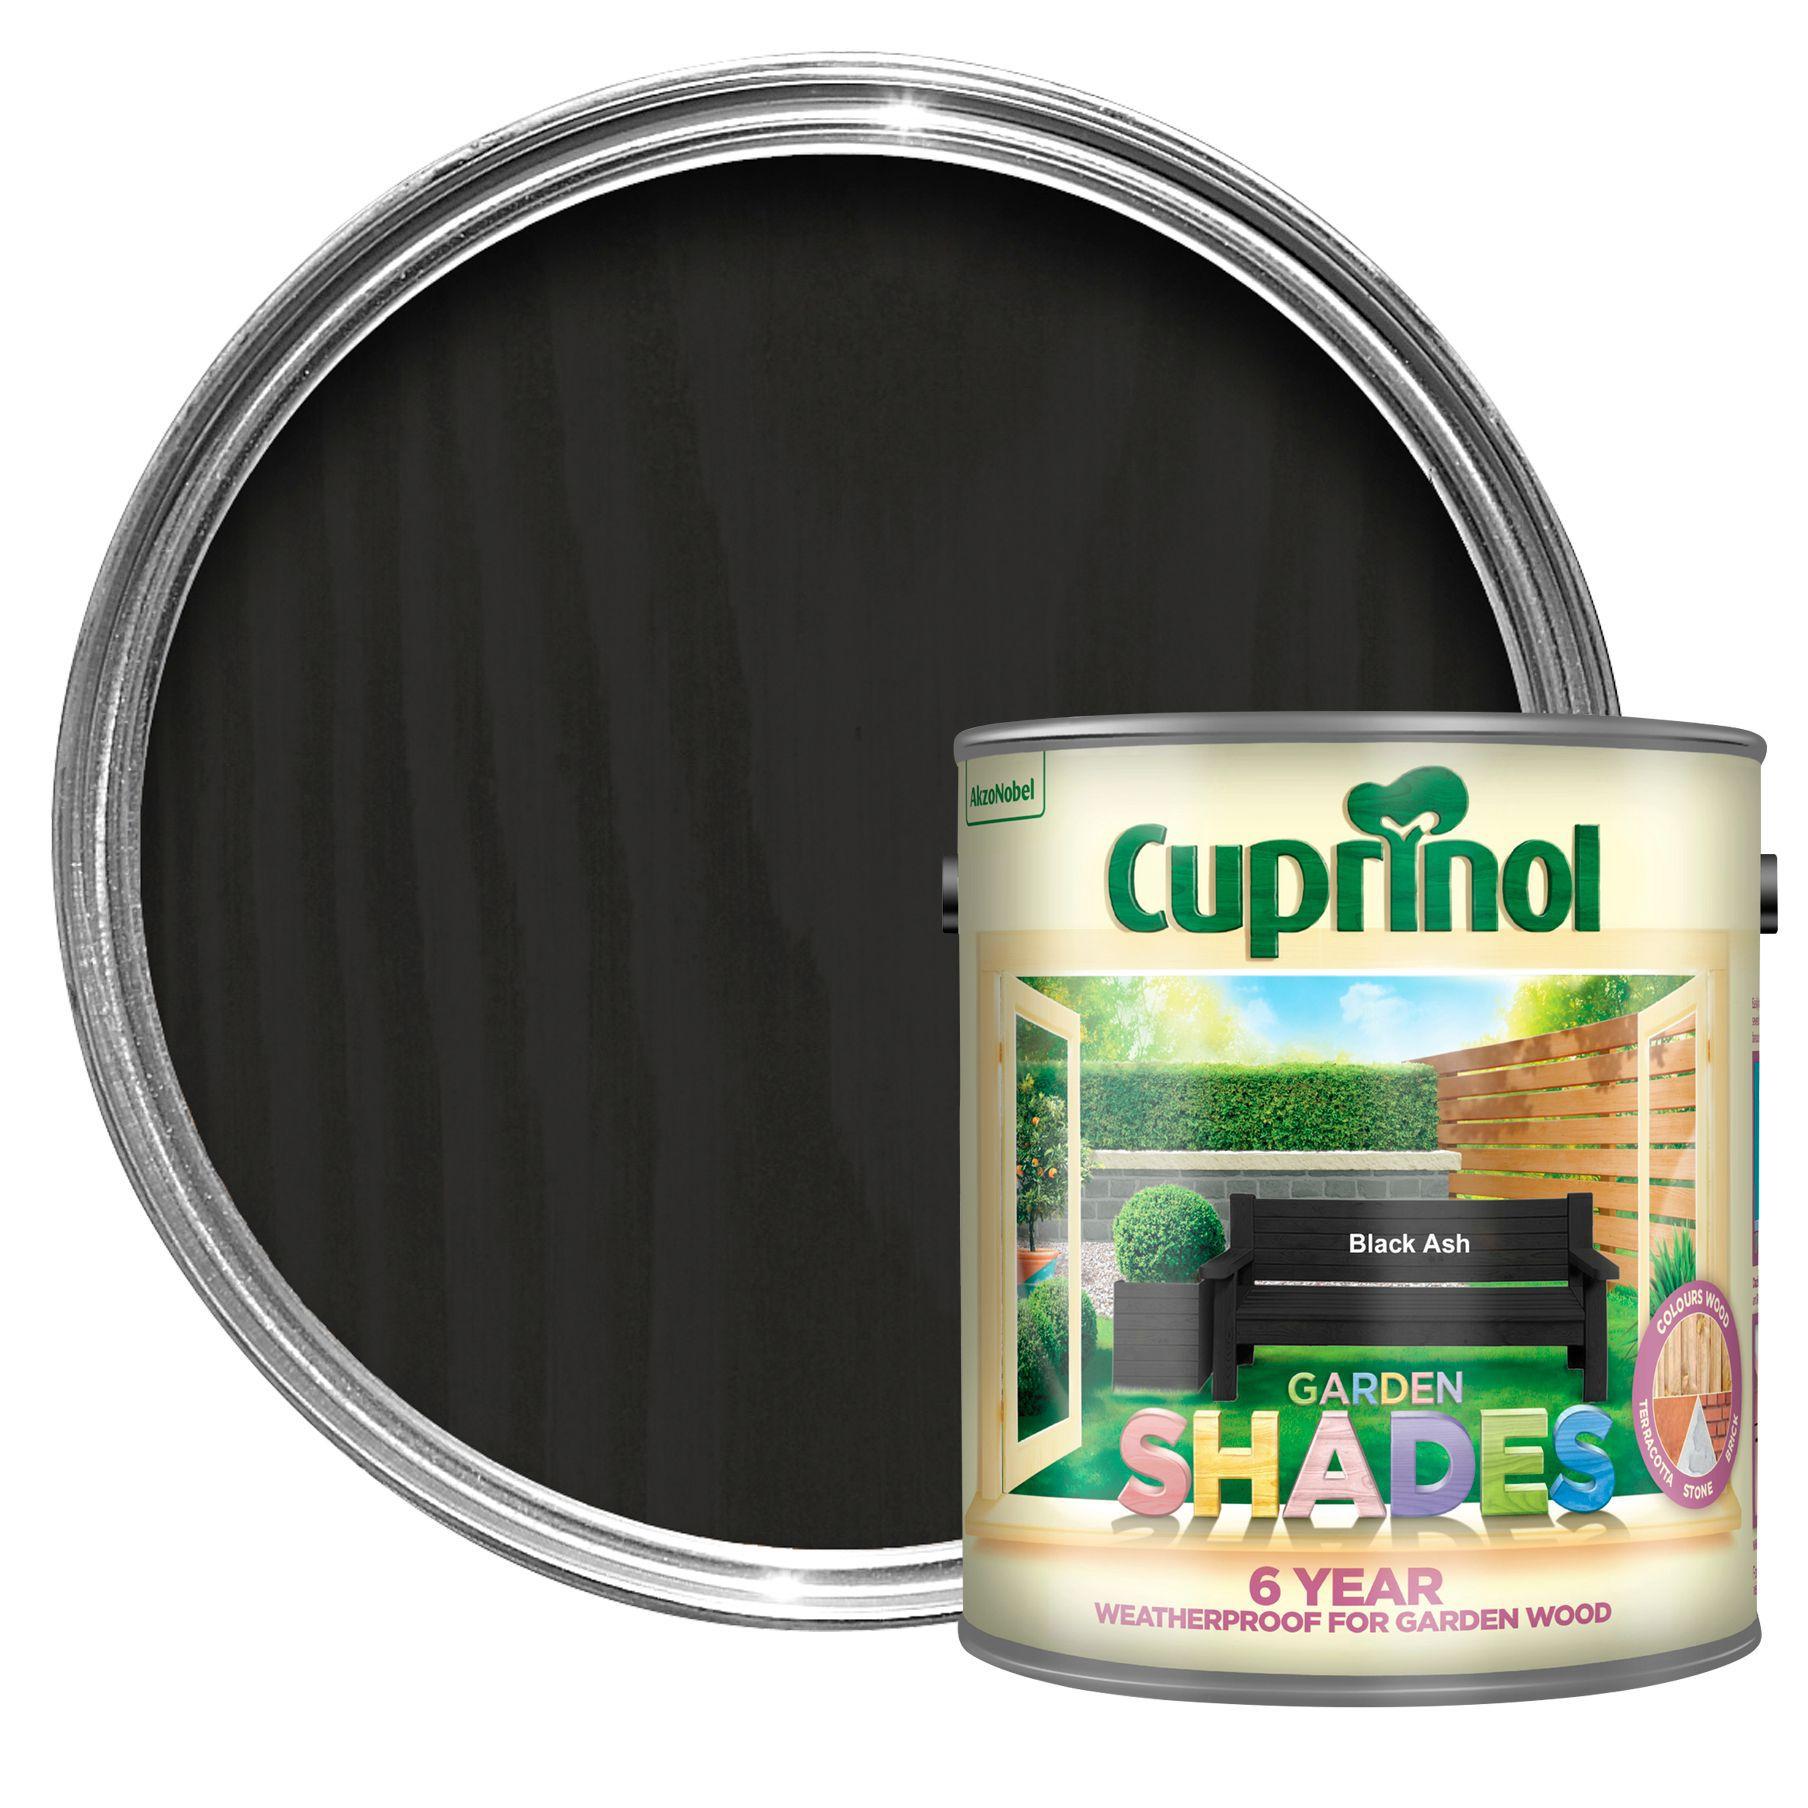 Cuprinol Garden Shades Black Ash Matt Wood Paint 2 5l Departments Diy At B Q